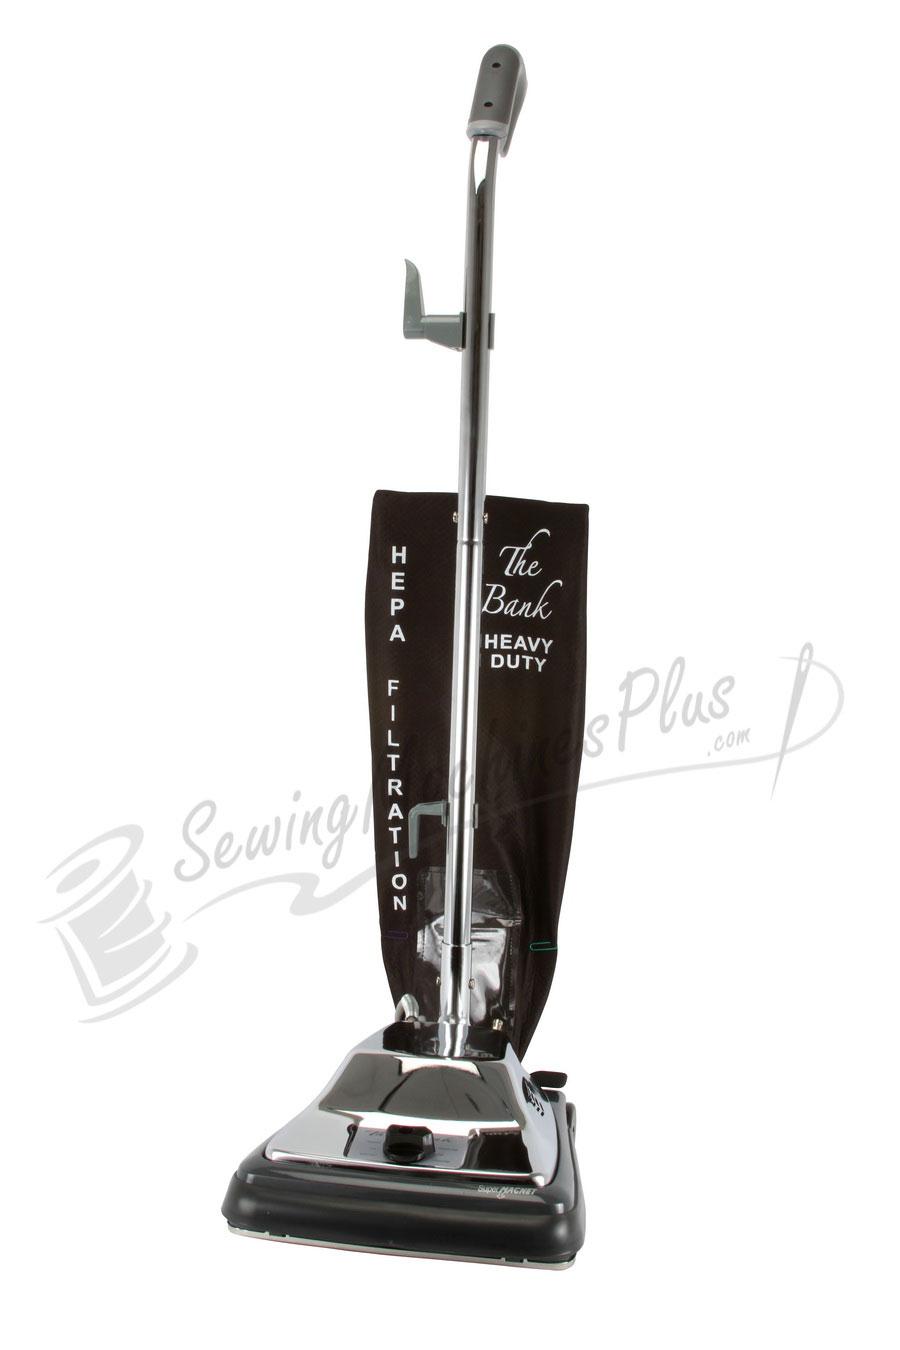 The Bank Heavy Duty Upright Vacuum